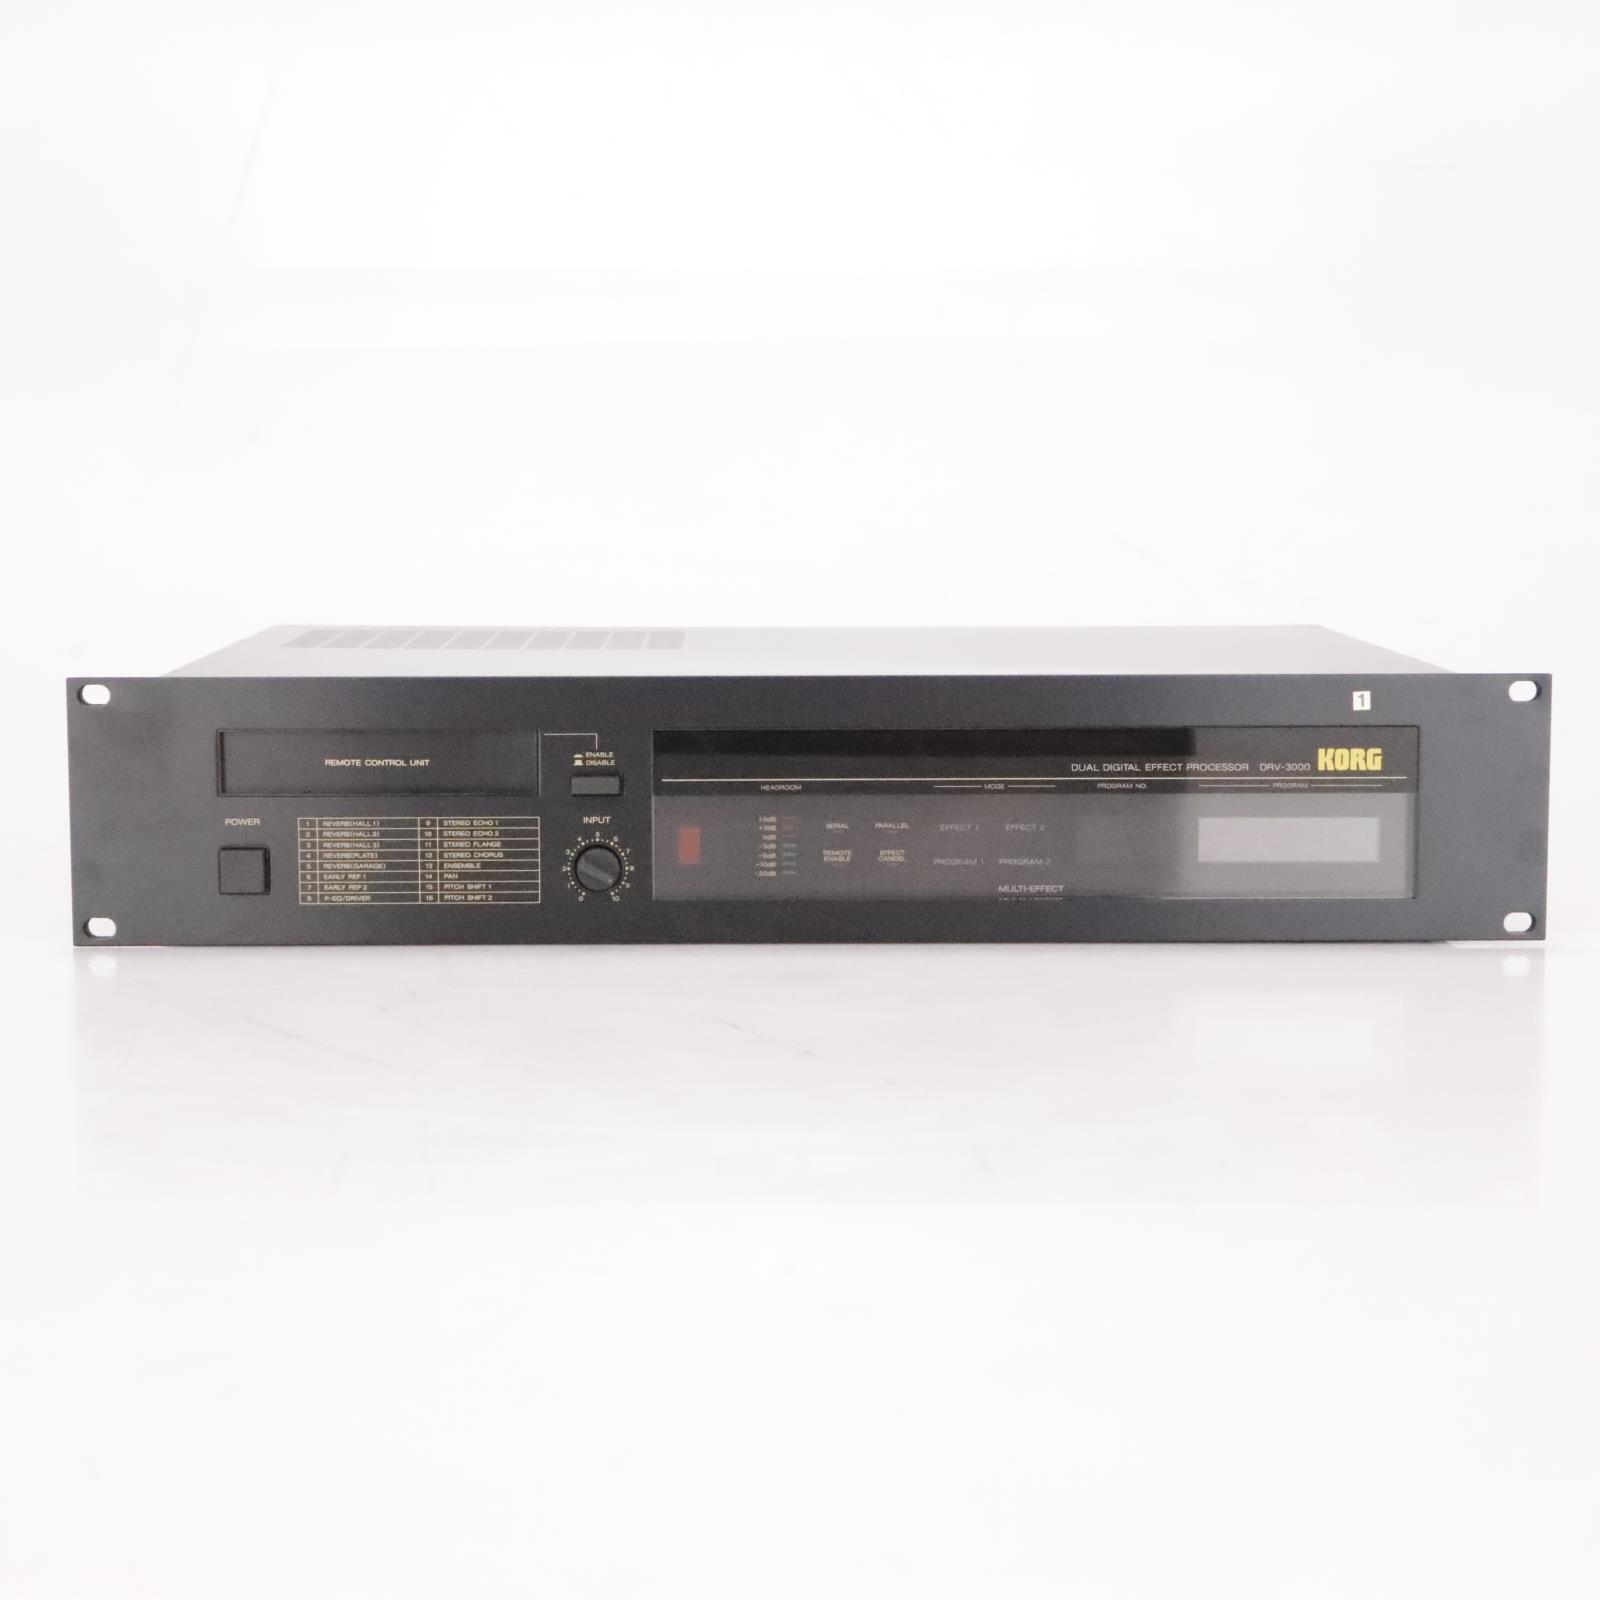 Korg DRV-3000 Dual Digital Effects Processor w/ Remote #37102